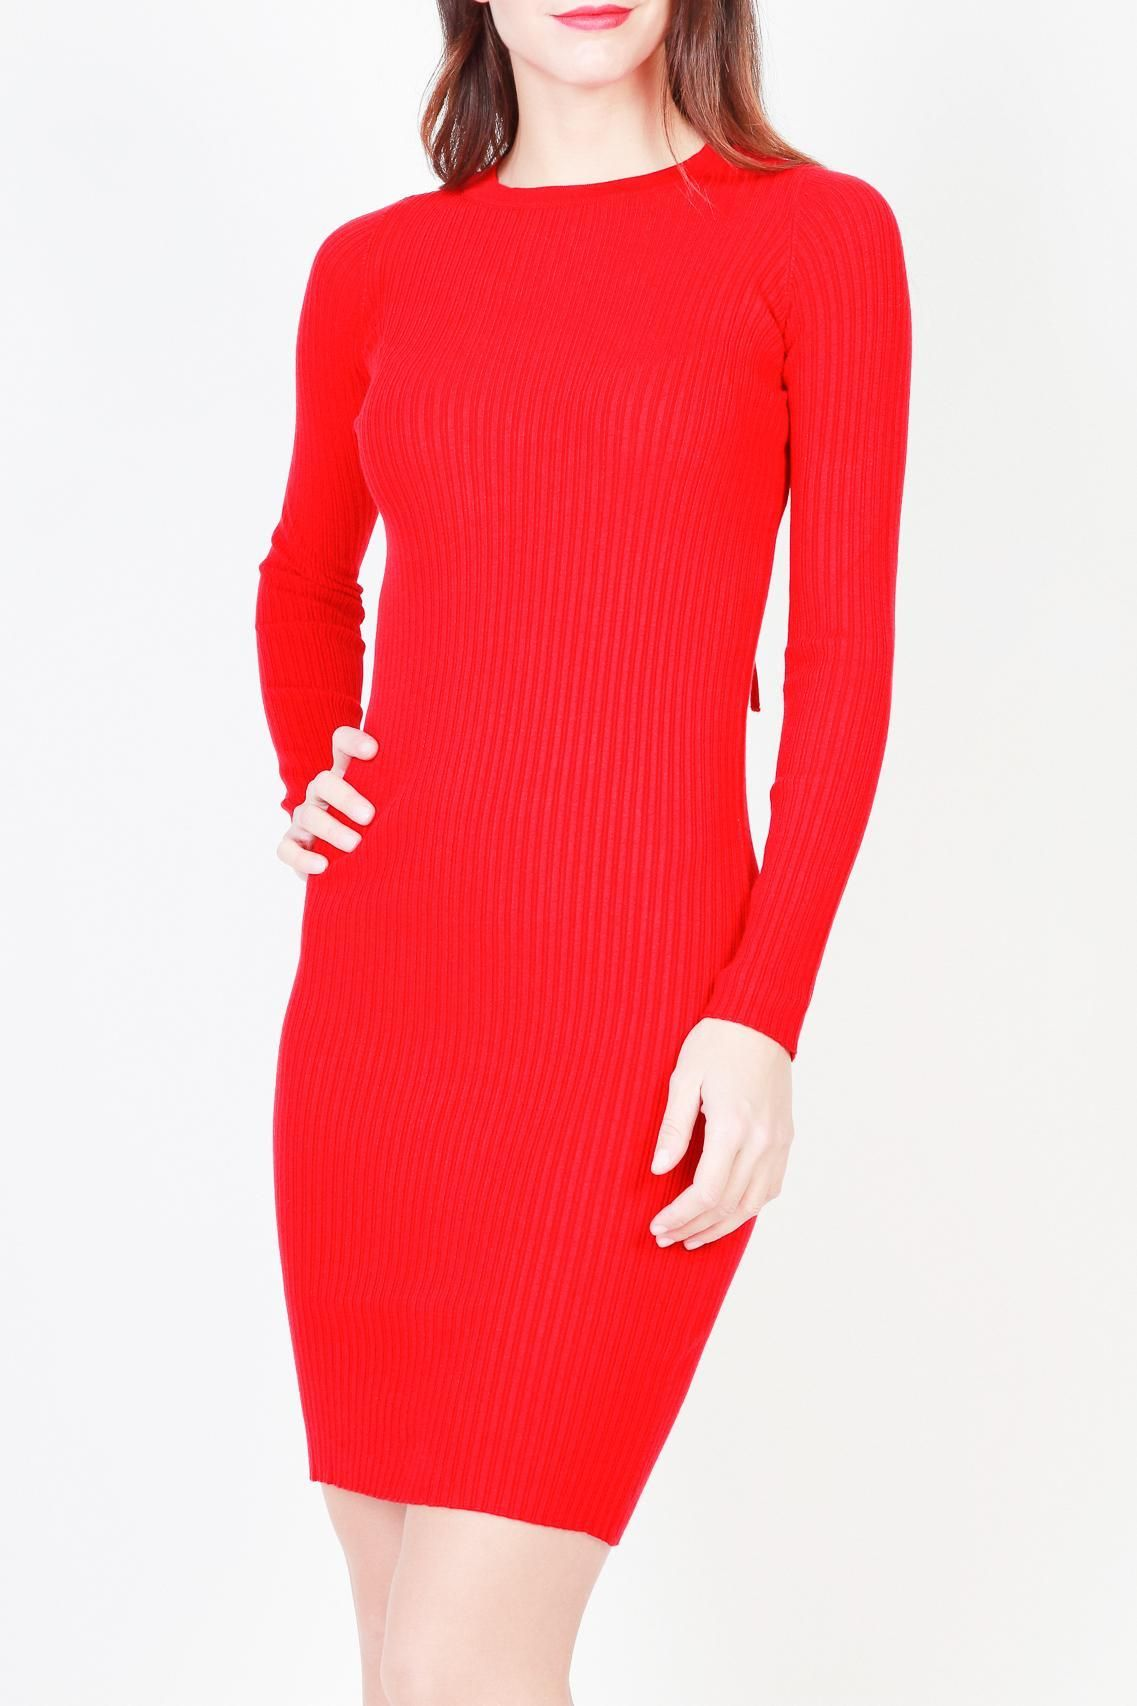 ca3539aee10 Pinko Red V-Neck Long Sleeve Knit Dress